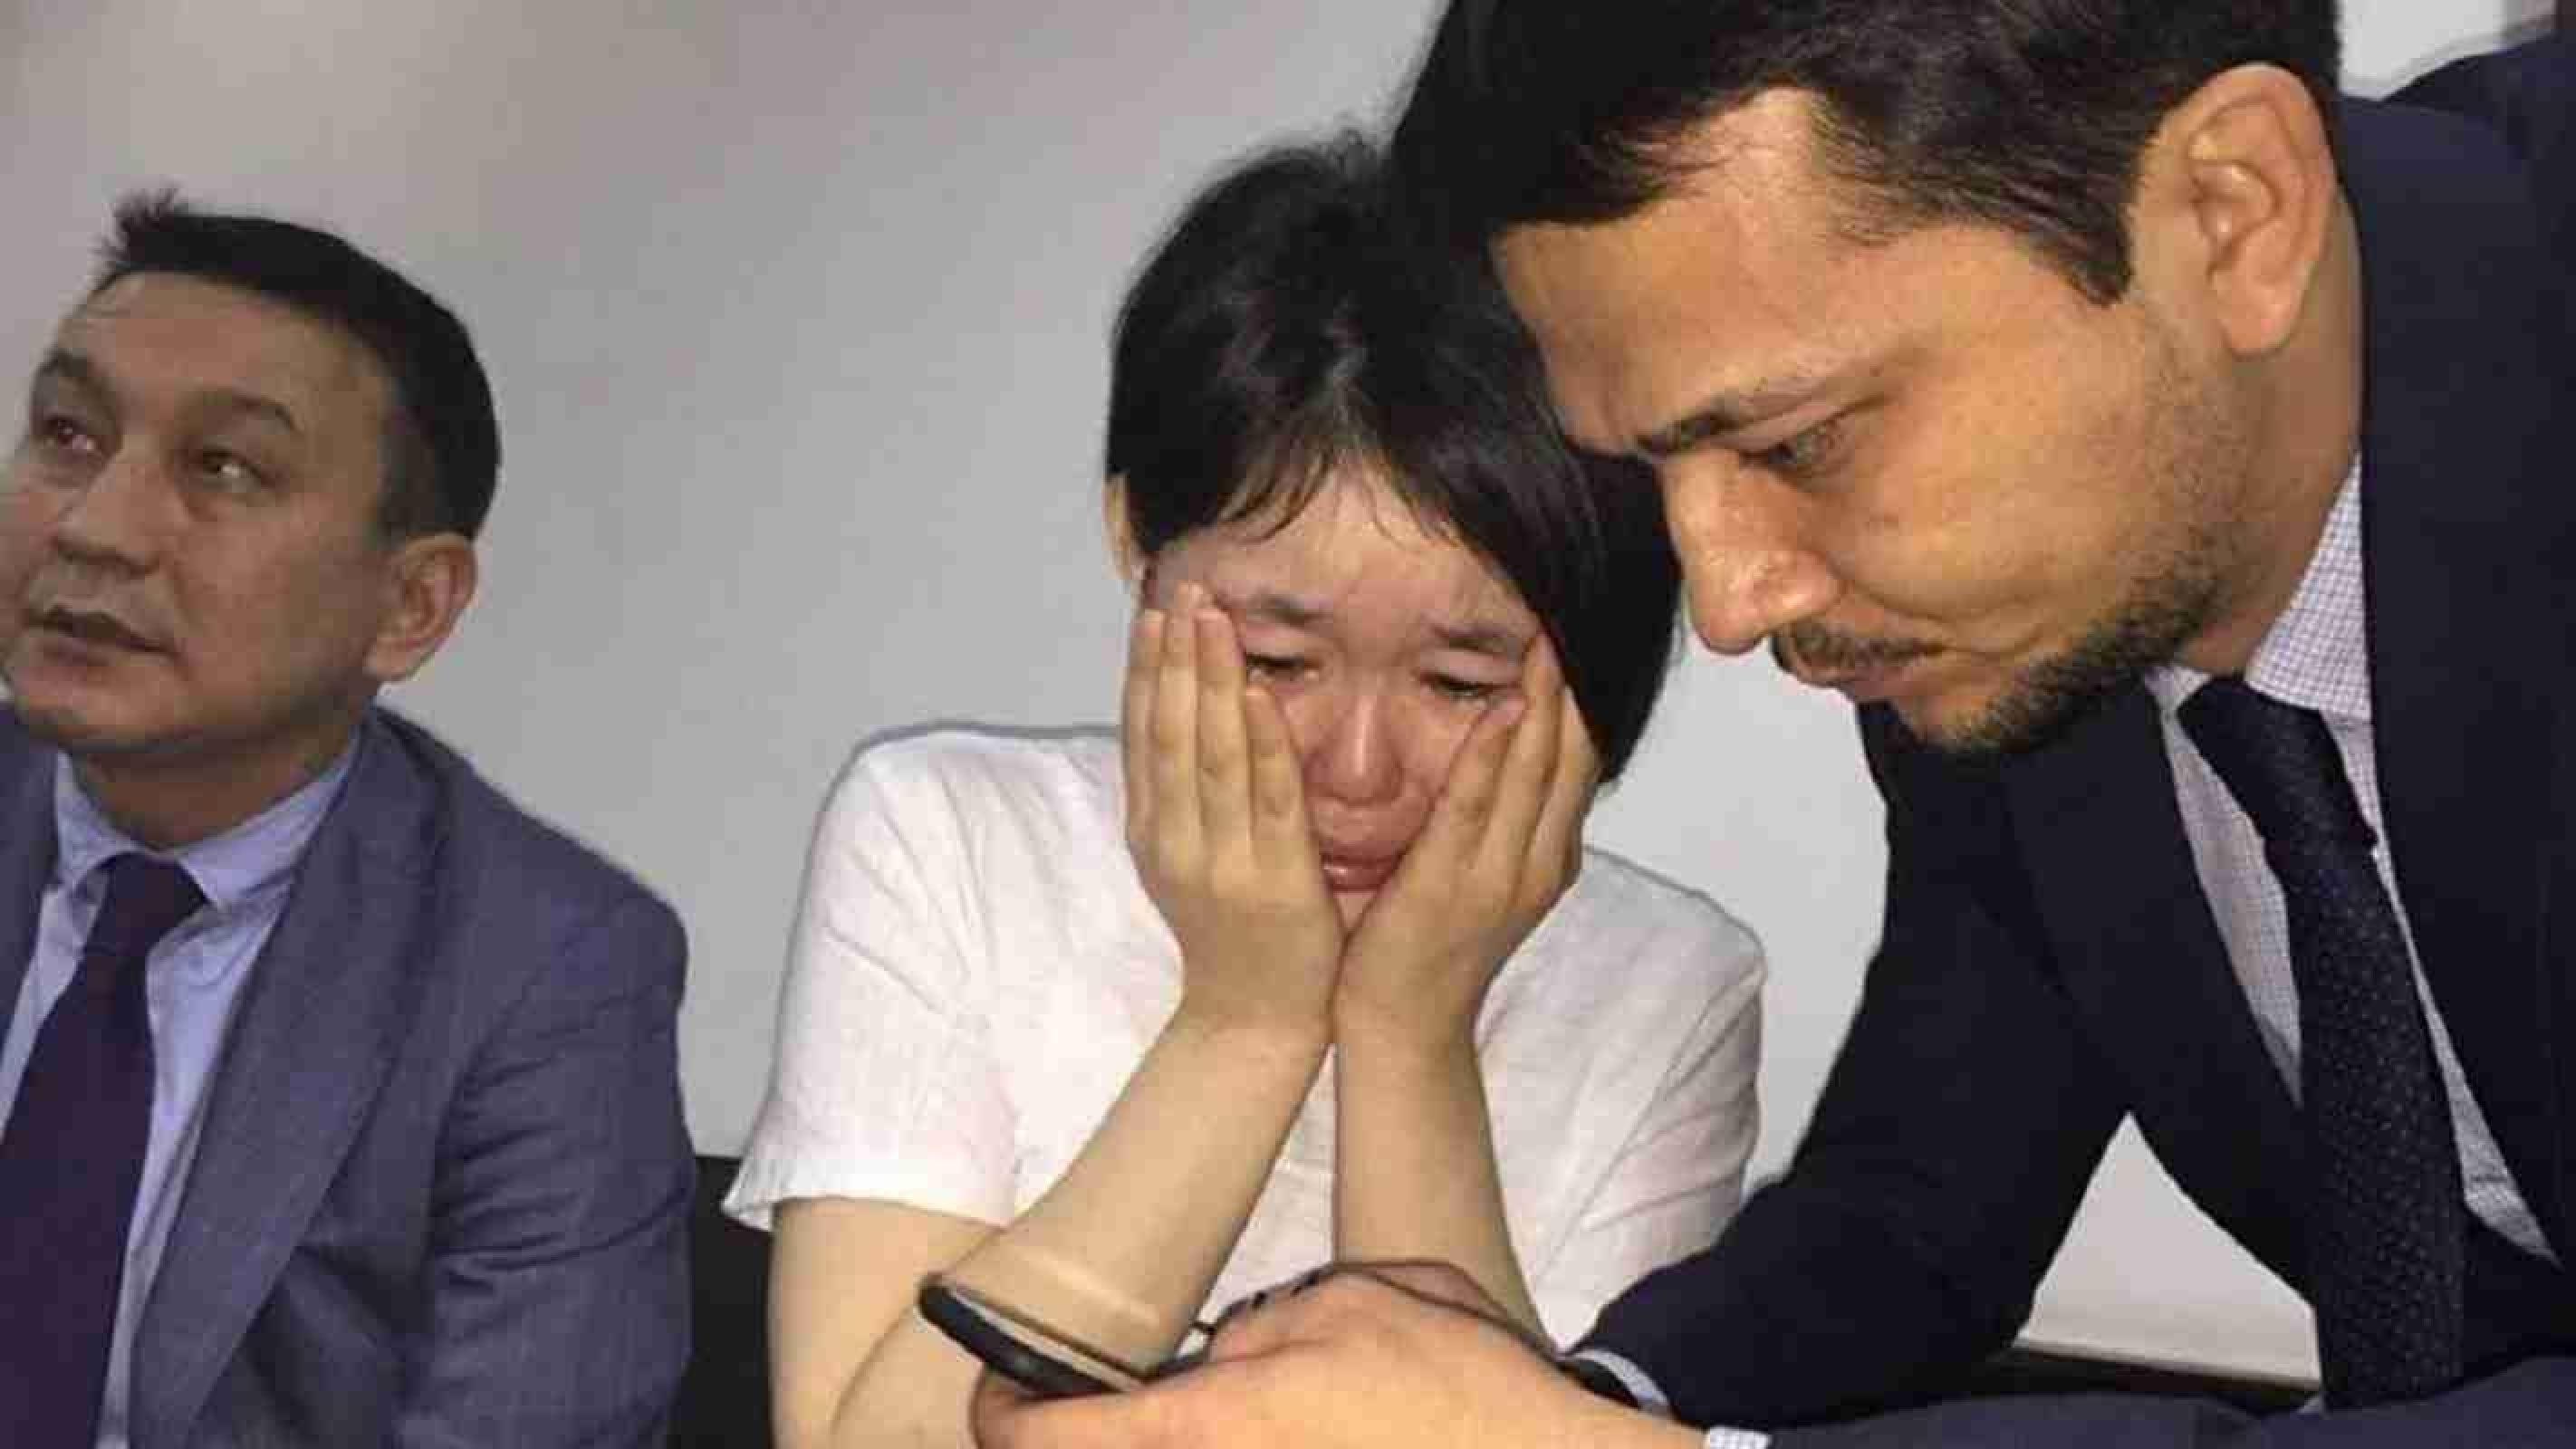 Генпрокуратура Казахстана проведет переговоры с Китаем о передаче Акжаркын Турлыбай